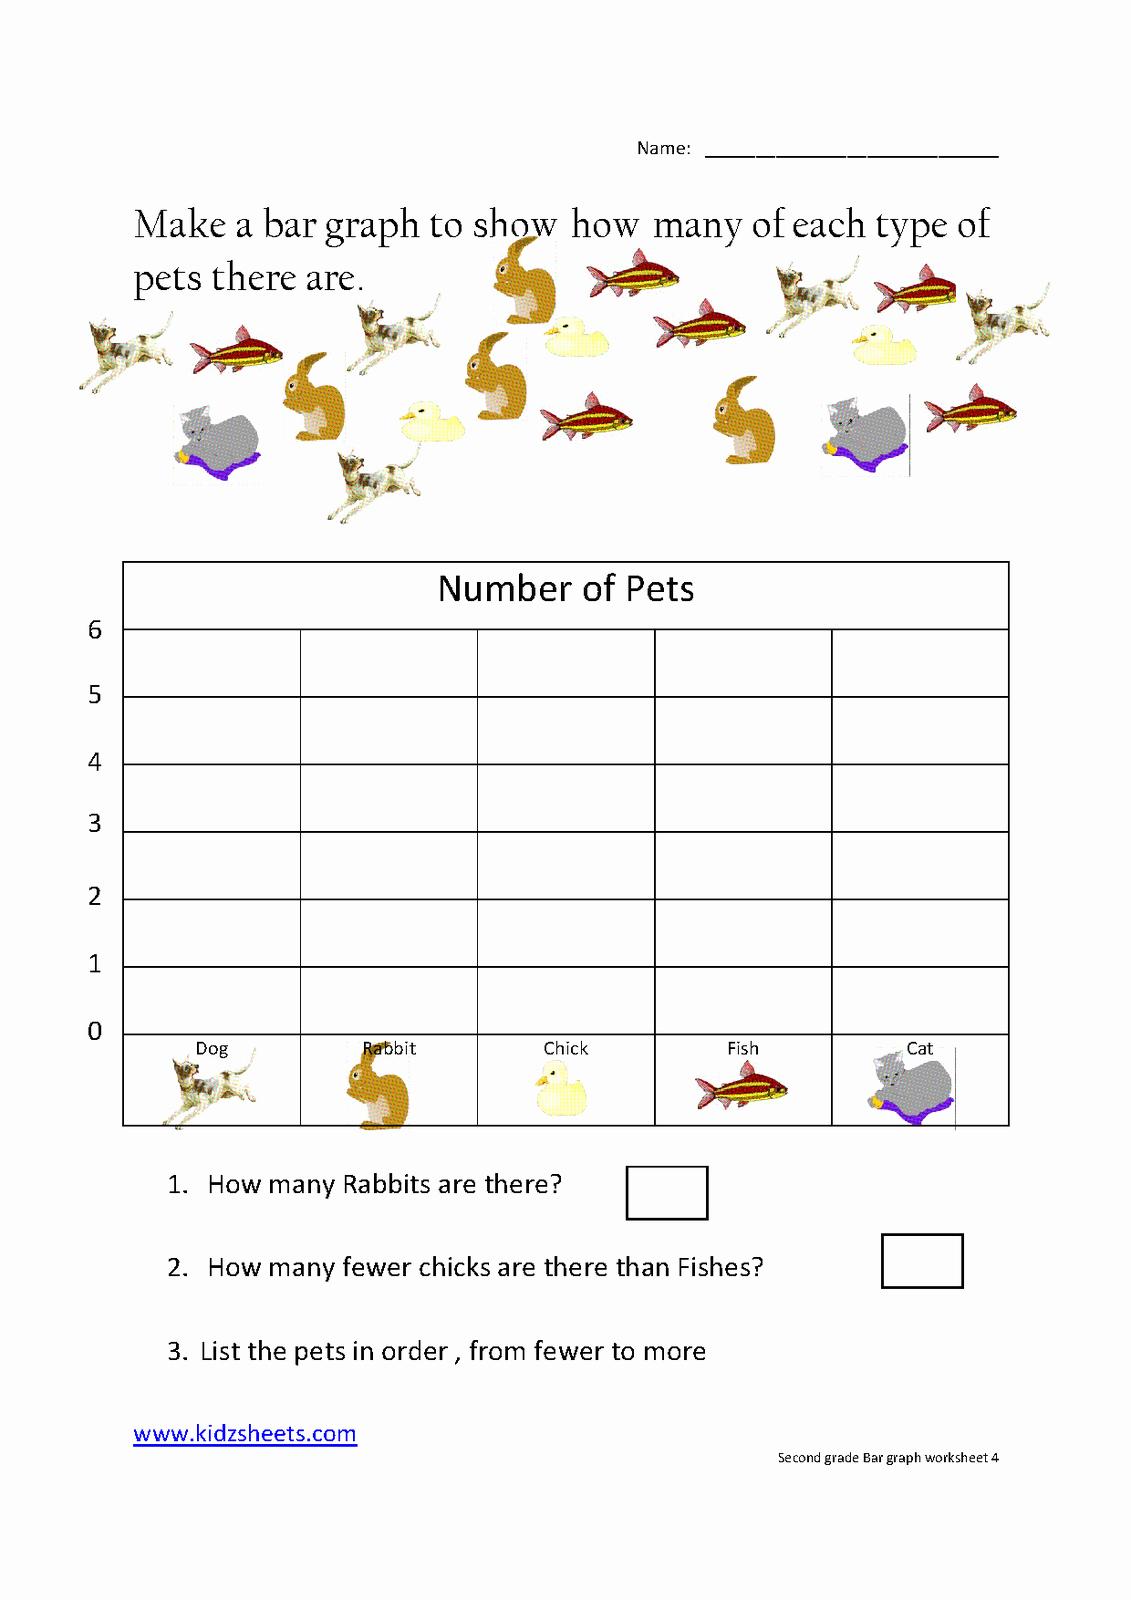 Creating Bar Graph Worksheets Awesome Kidz Worksheets Second Grade Bar Graph Worksheet4